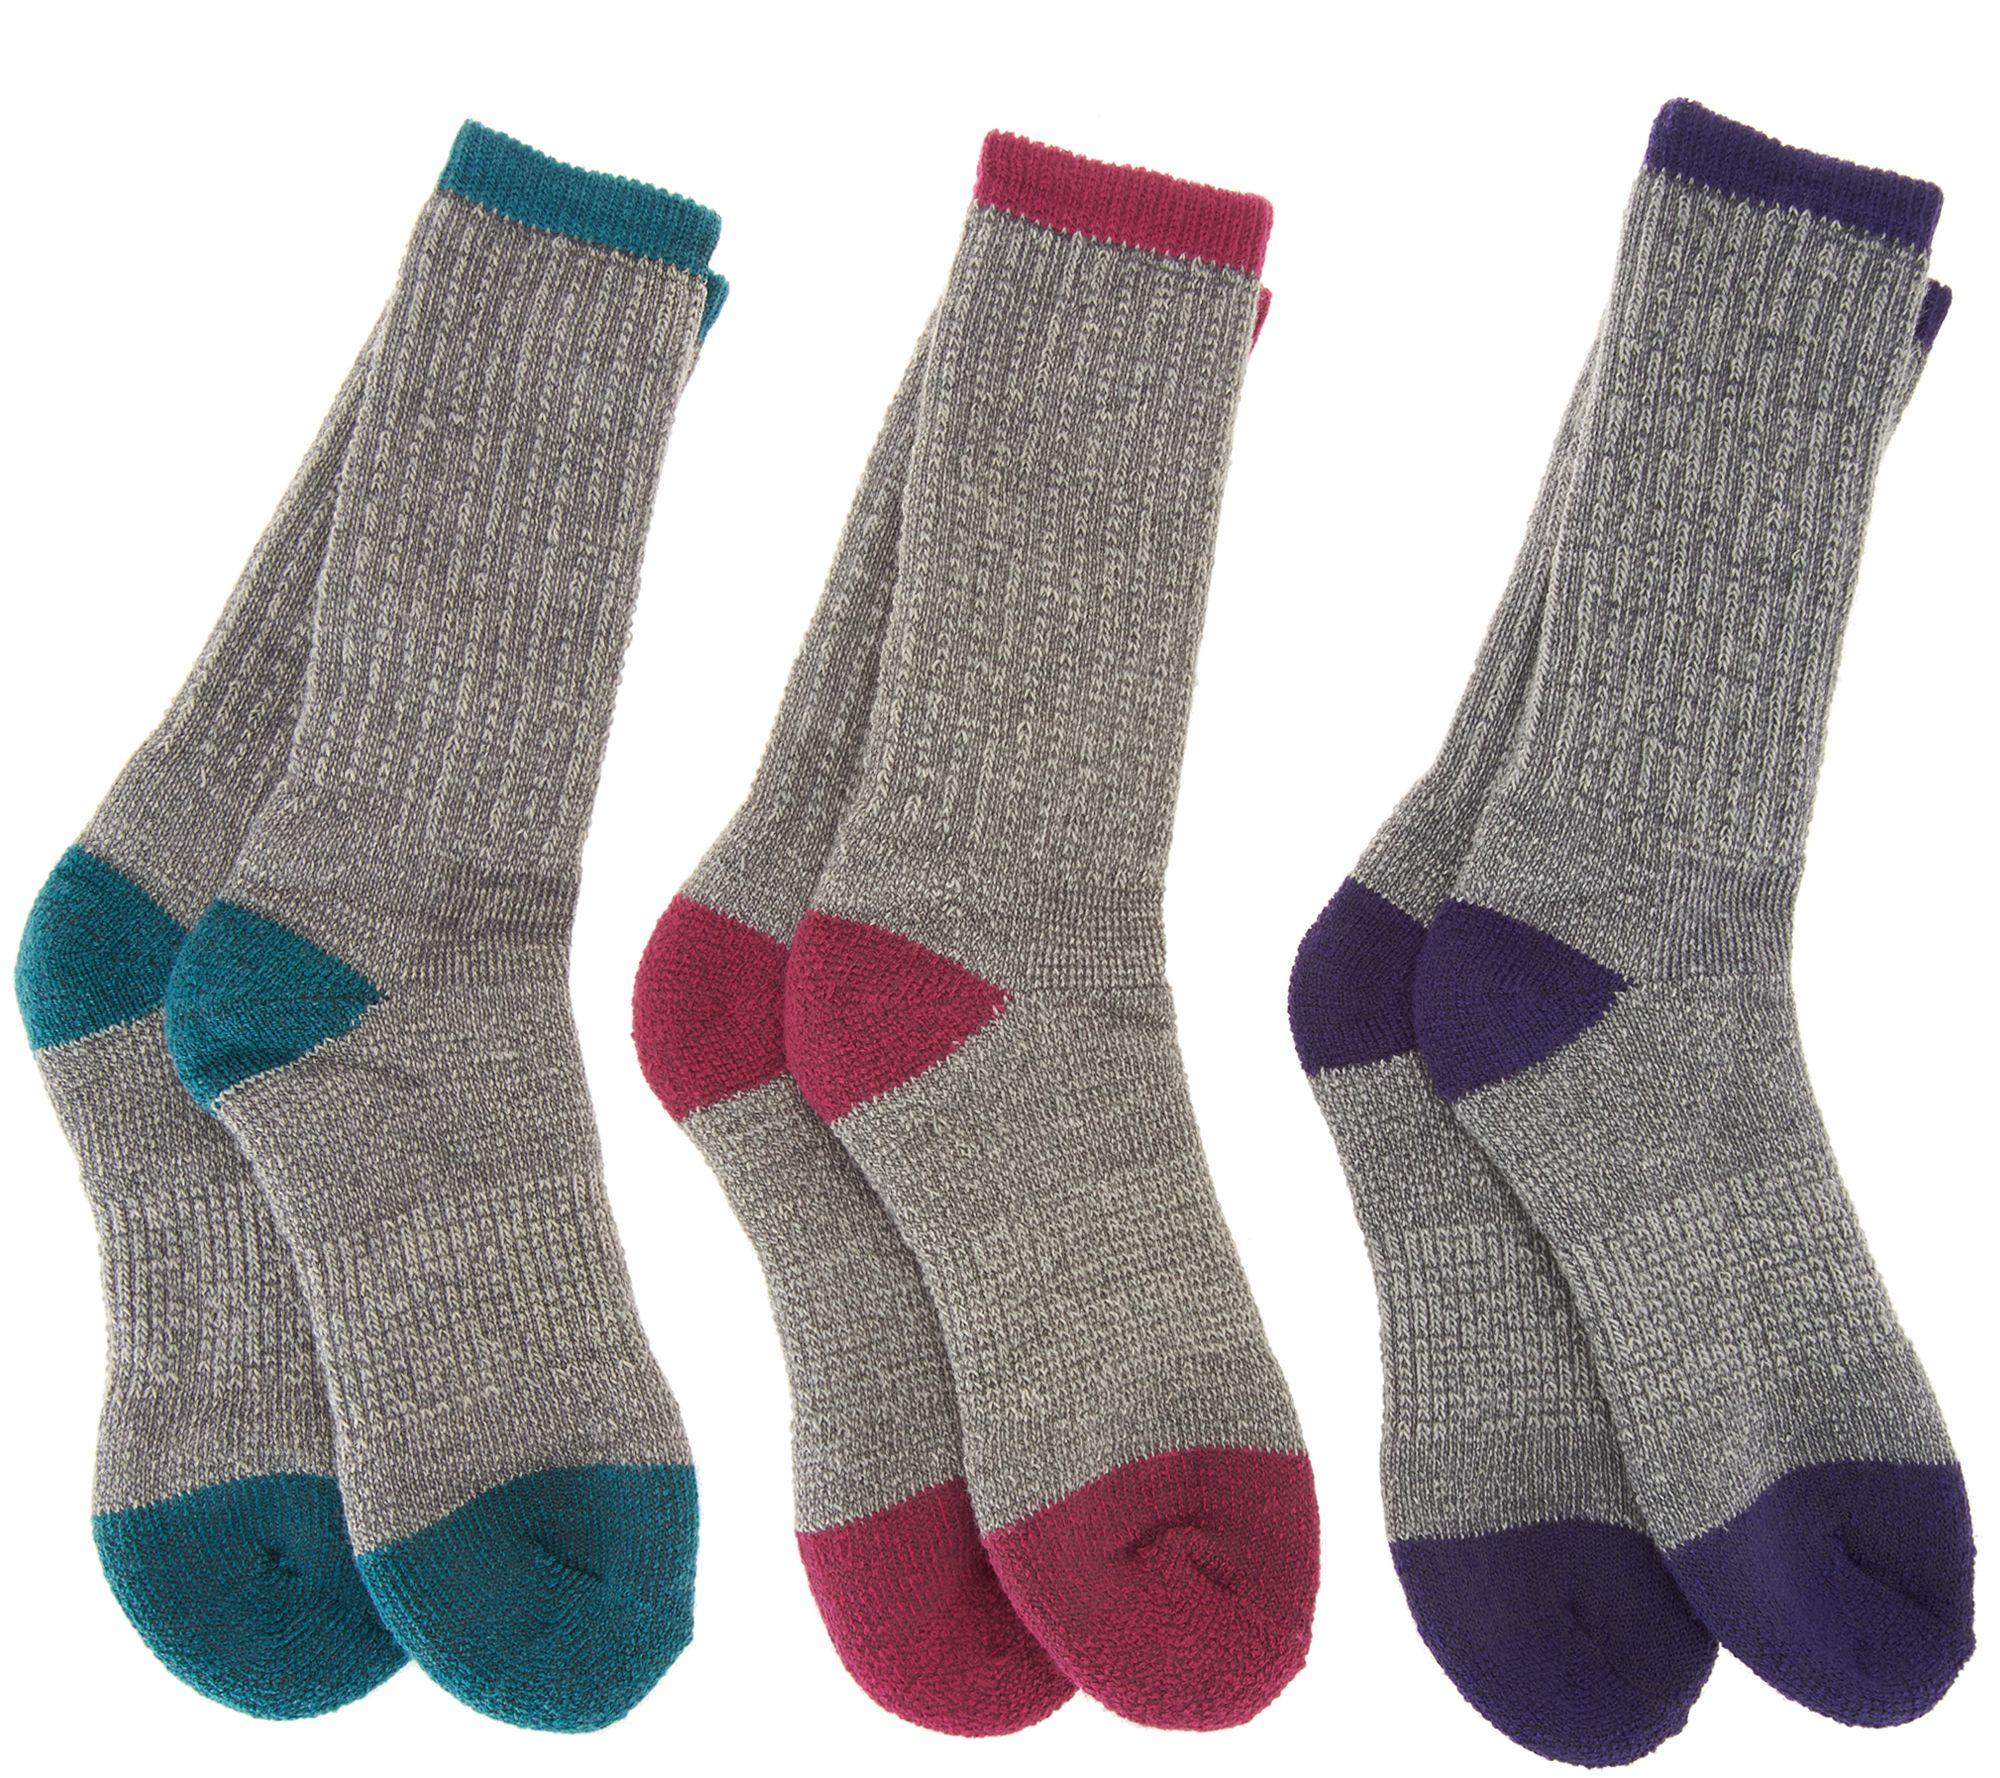 3fbee0a78e96 Catawba Set of 3 Merino Wool Blend Boot Socks - Page 1 — QVC.com